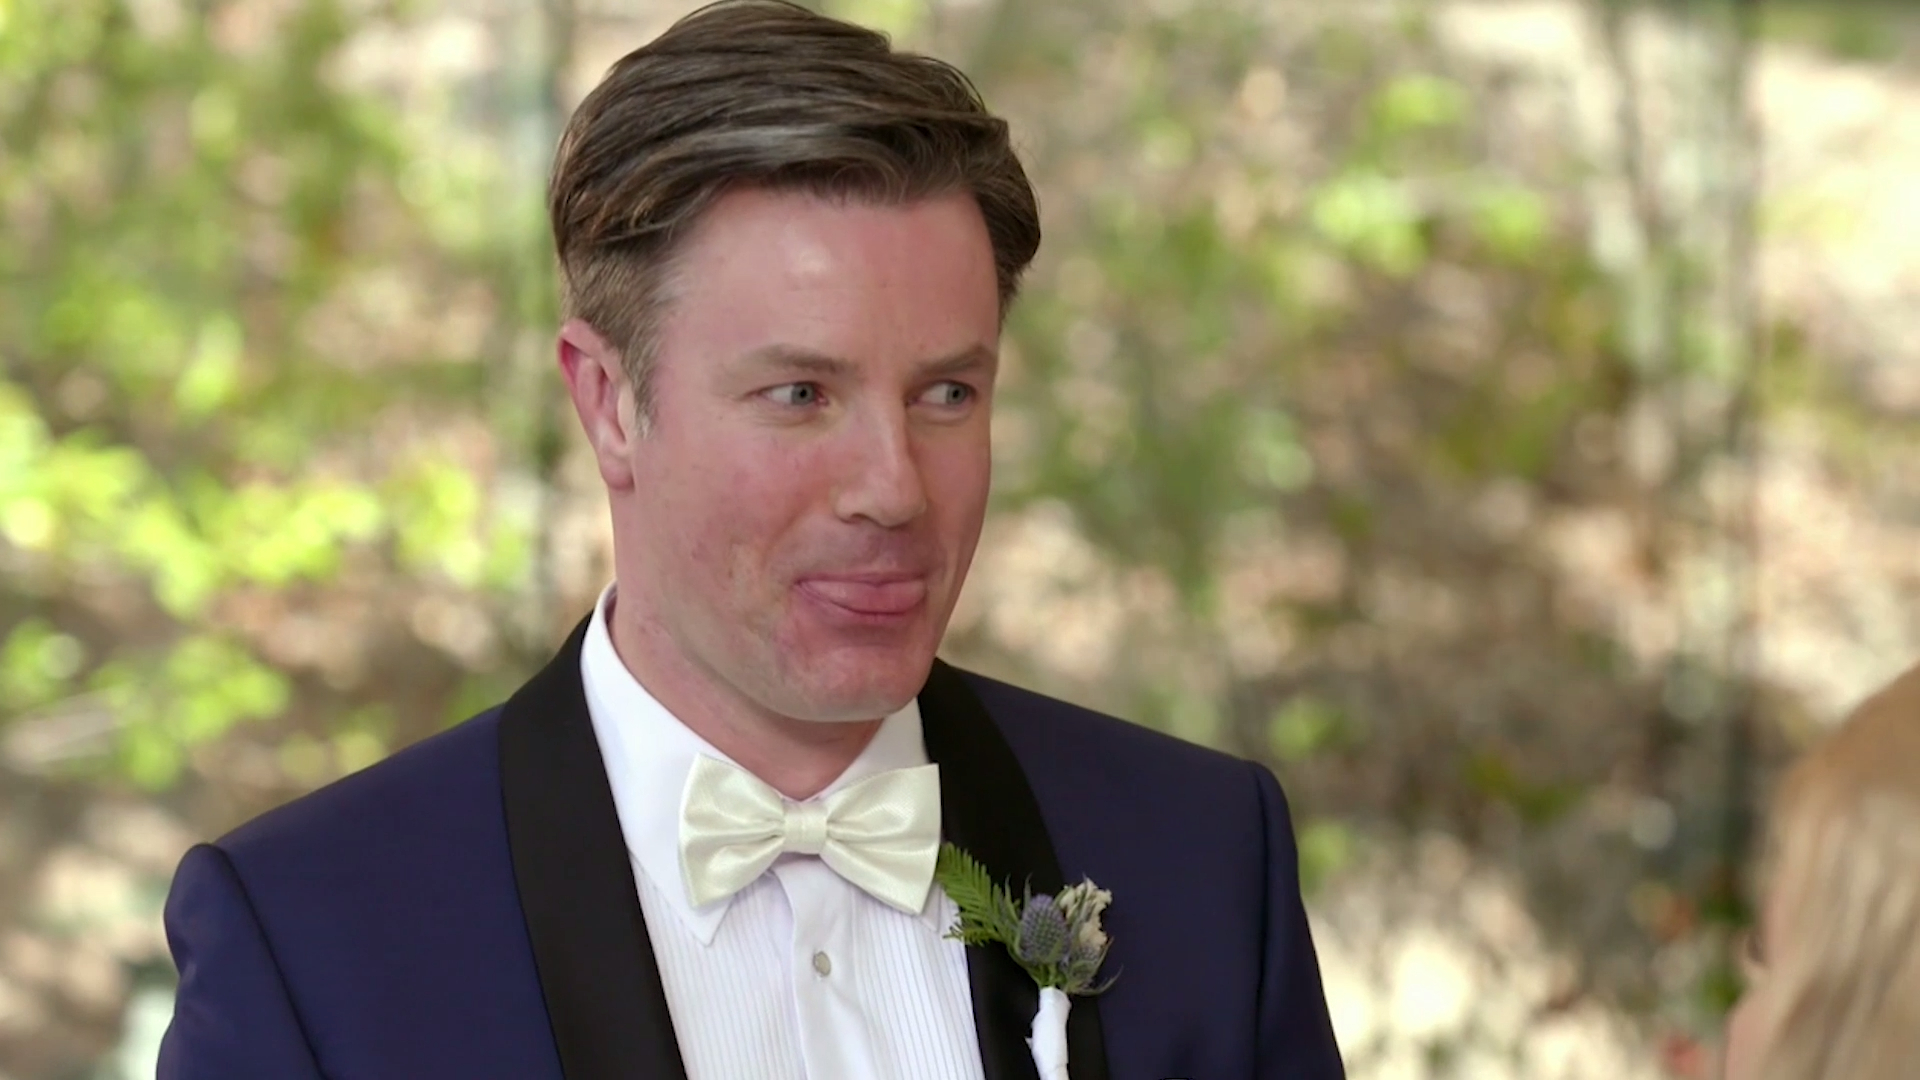 MAFS' most hilarious weddings